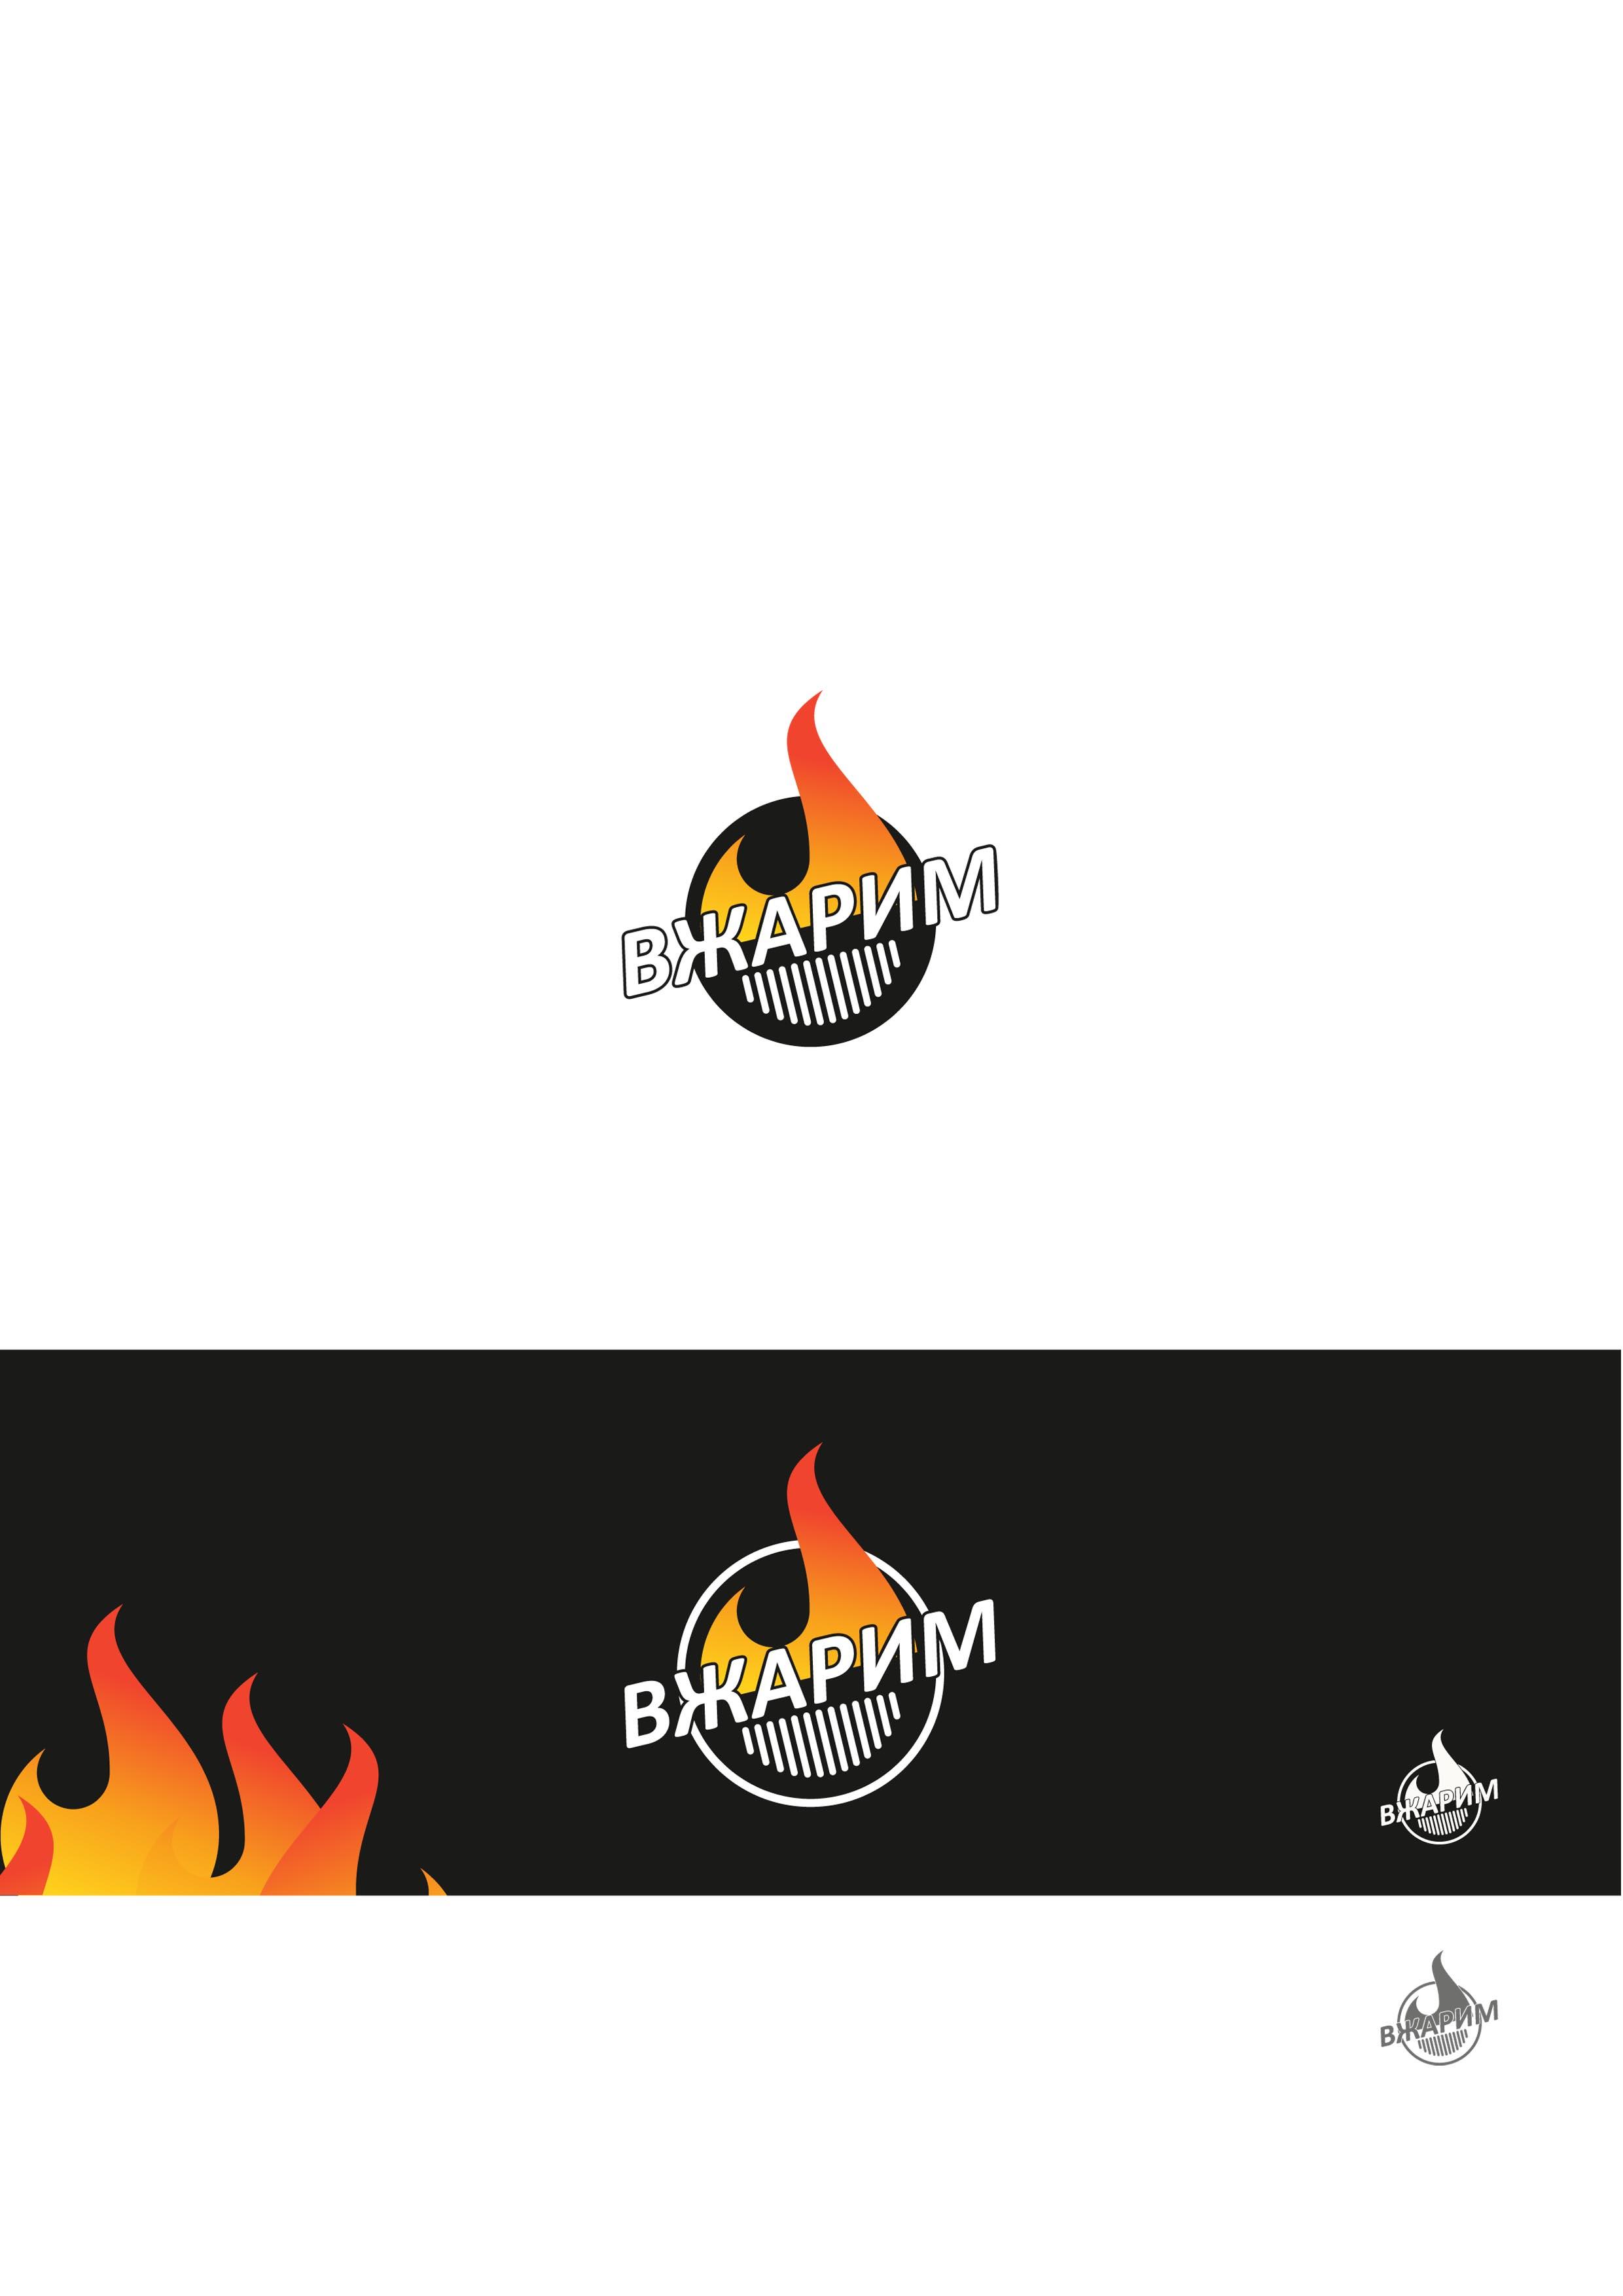 Требуется, разработка логотипа для крафт-кафе «ВЖАРИМ». фото f_699601ede4d2533d.jpg